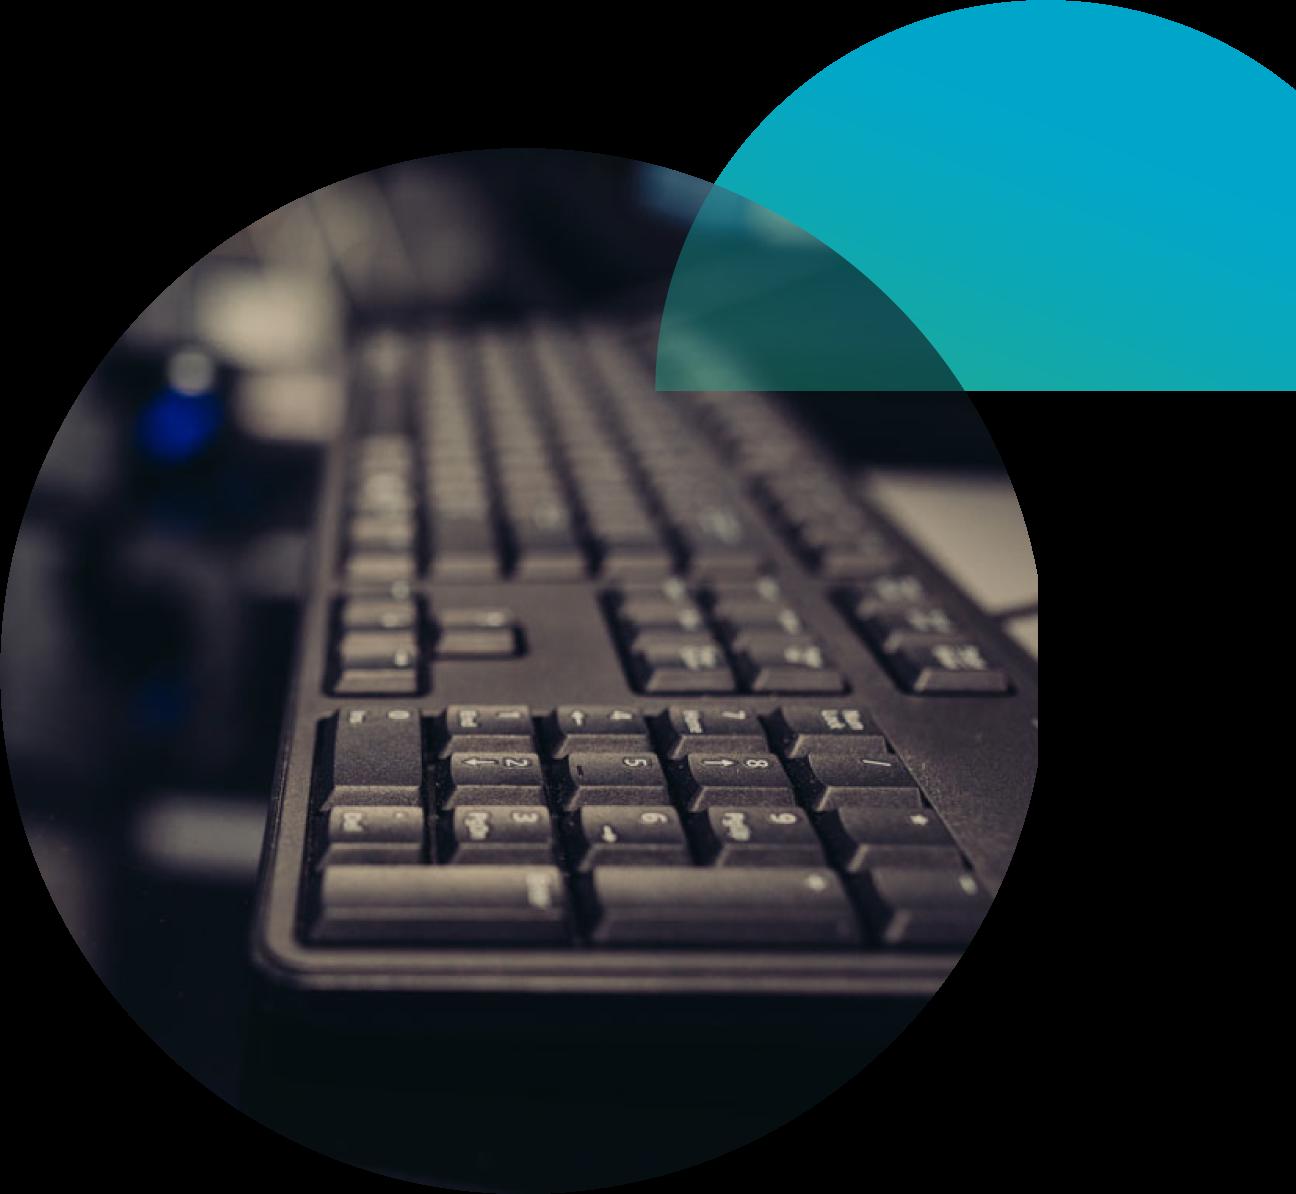 black plastic computer keyboard